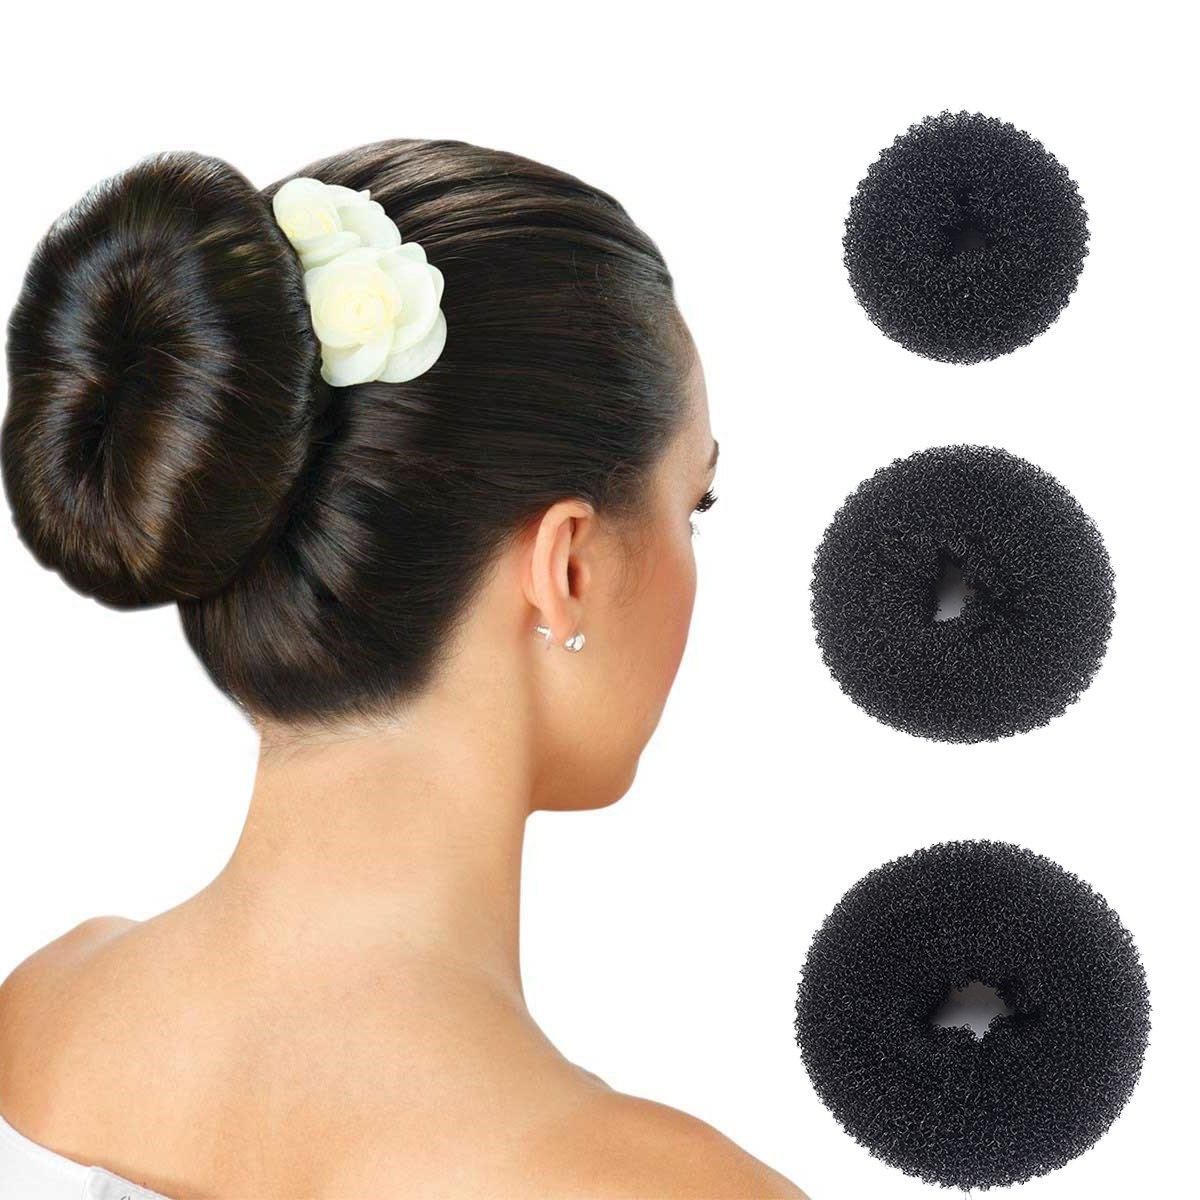 Amazon Hair Donut Bun Maker Ring Style Doughnut Shaper Chignon